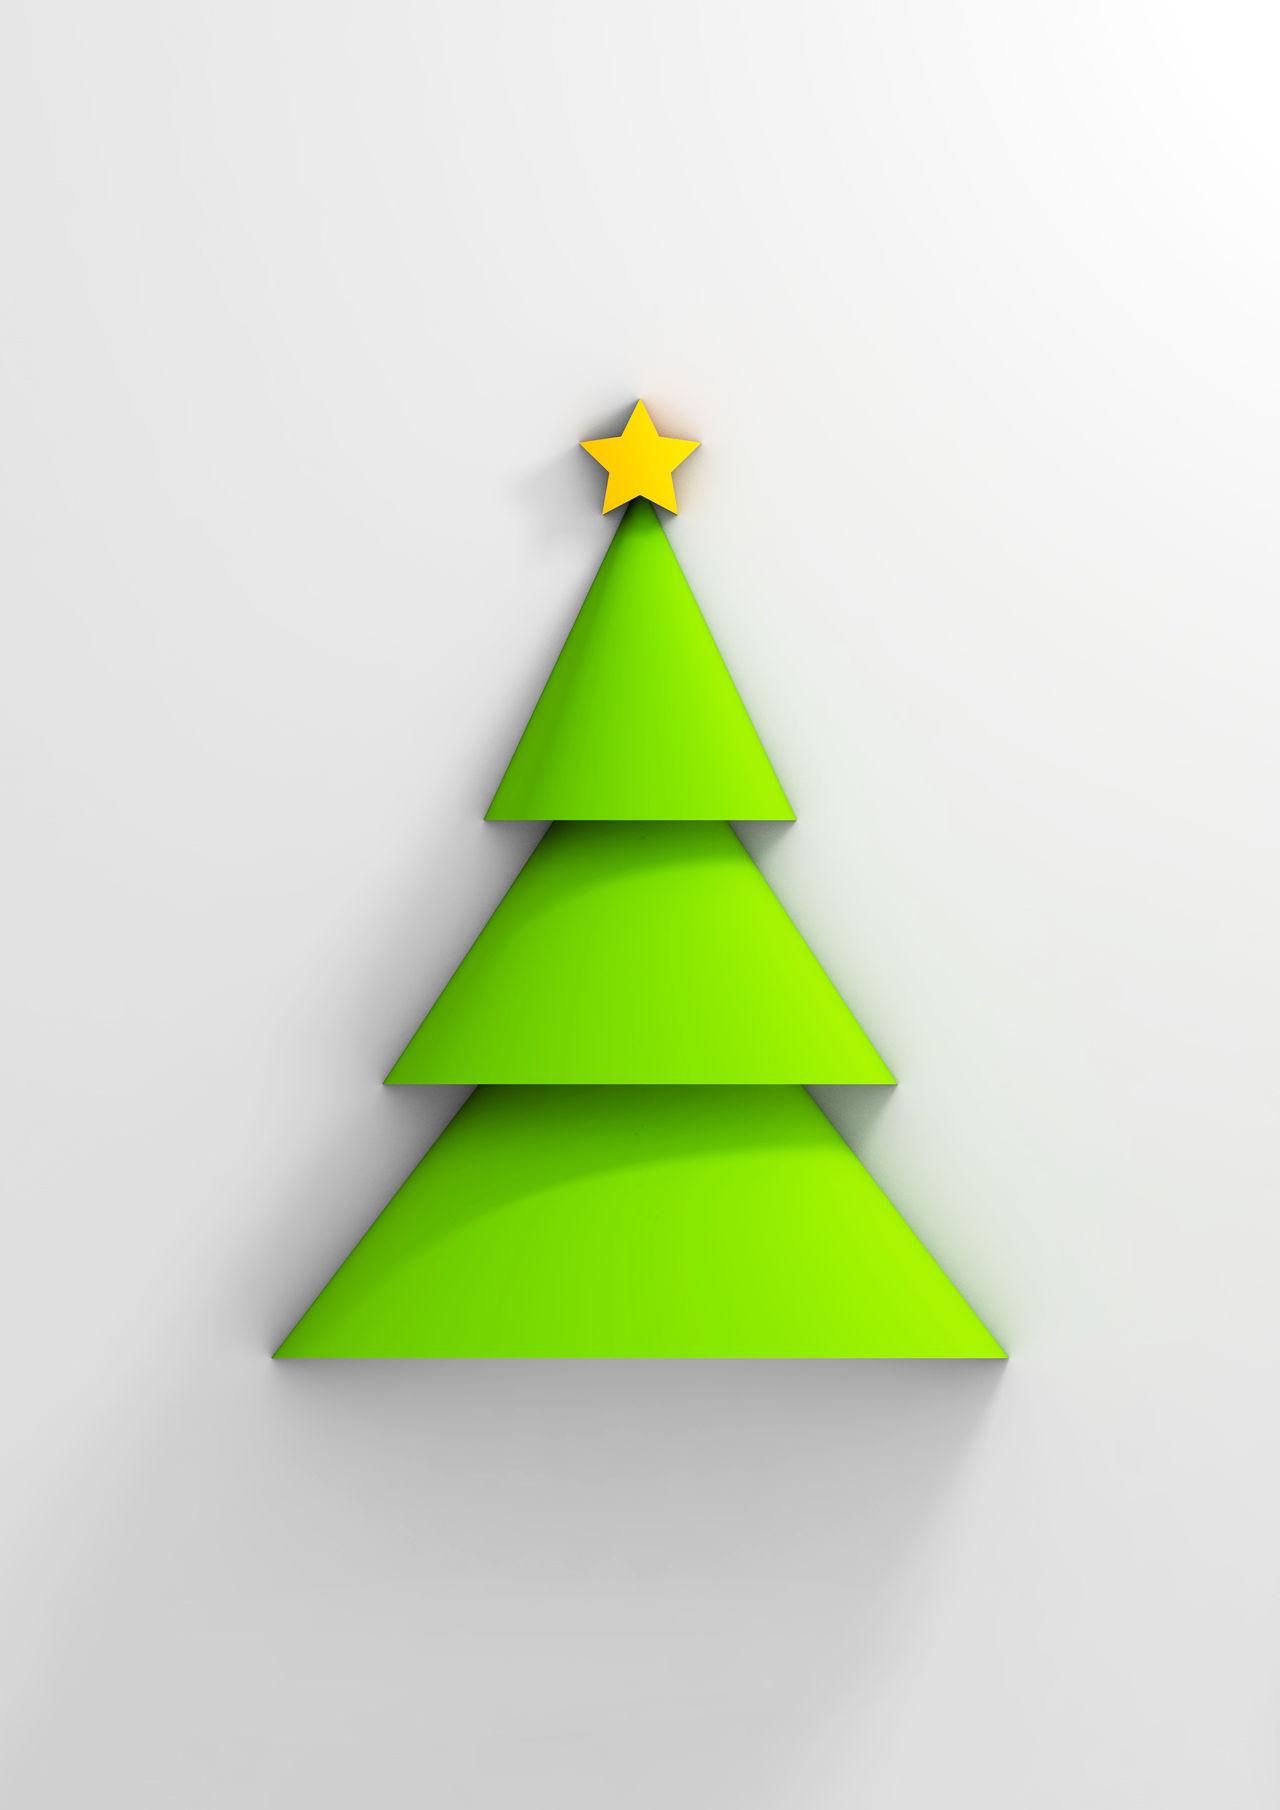 Geometrical christmas tree Christmas Tree Minimalism Geometric Shapes Star Xmas Xmas Tree Green Tree Infinity Shadow